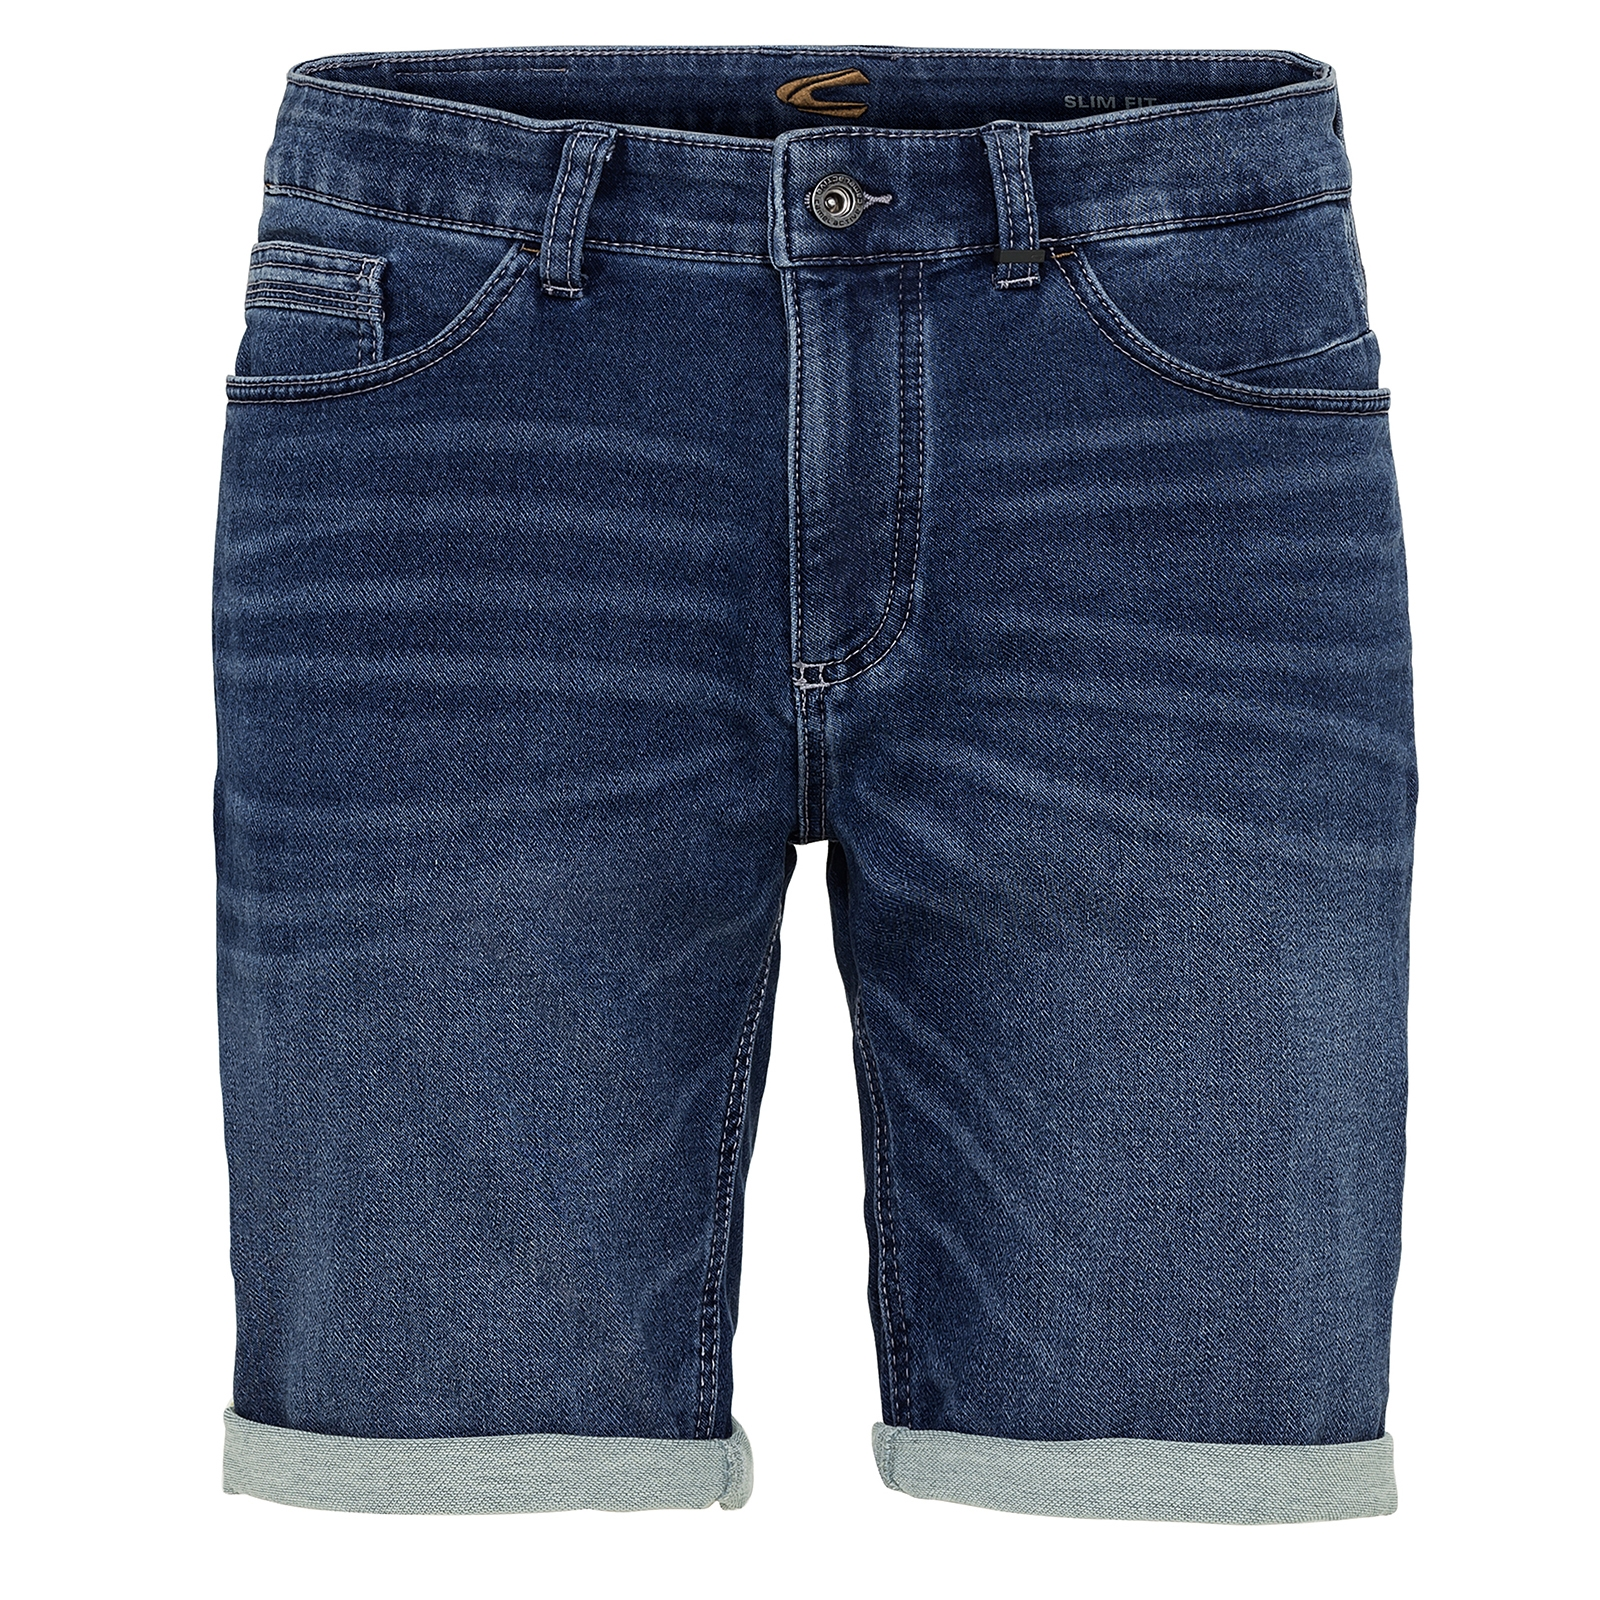 Camel active Jeans Shorts Madison Denim 5U73498225 83